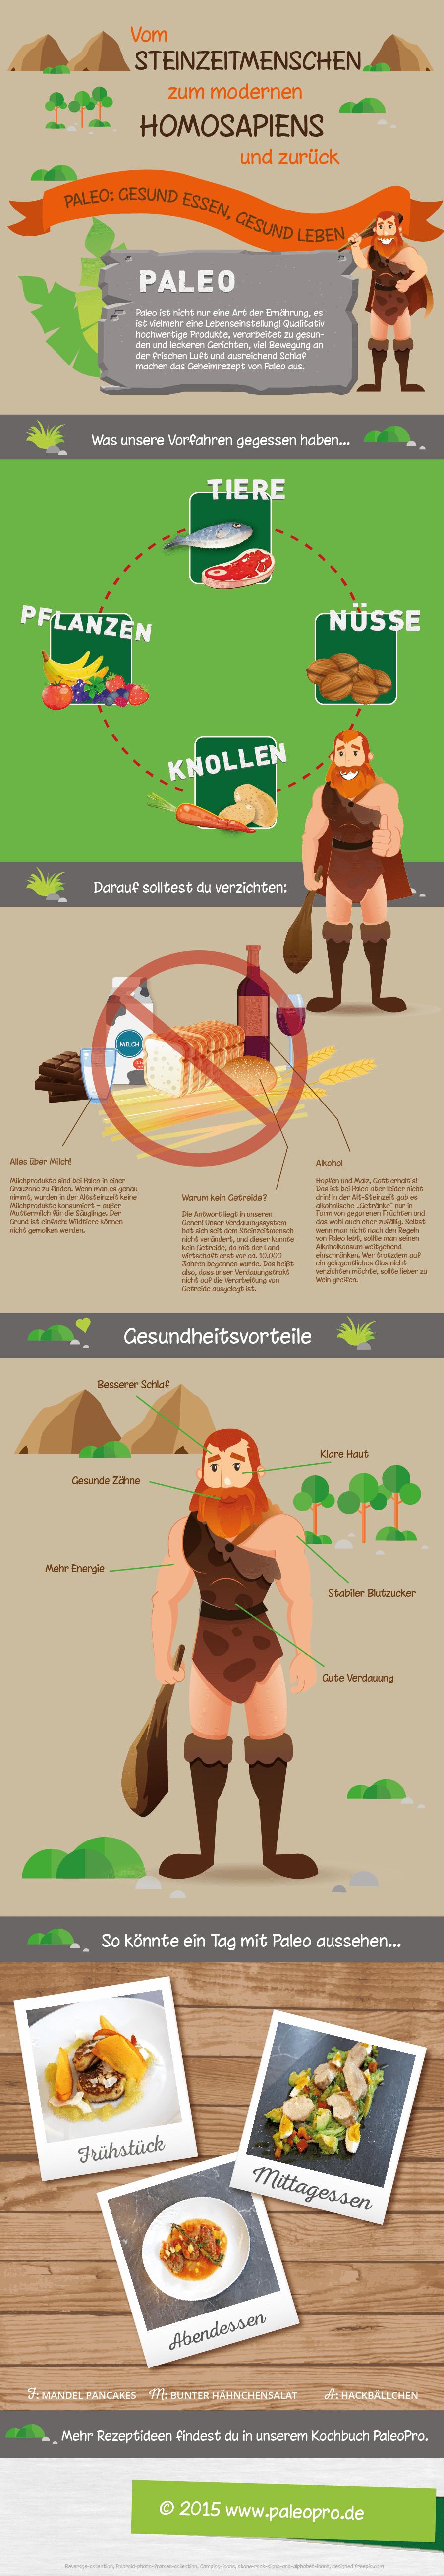 Paleo Geschichte - Infografik